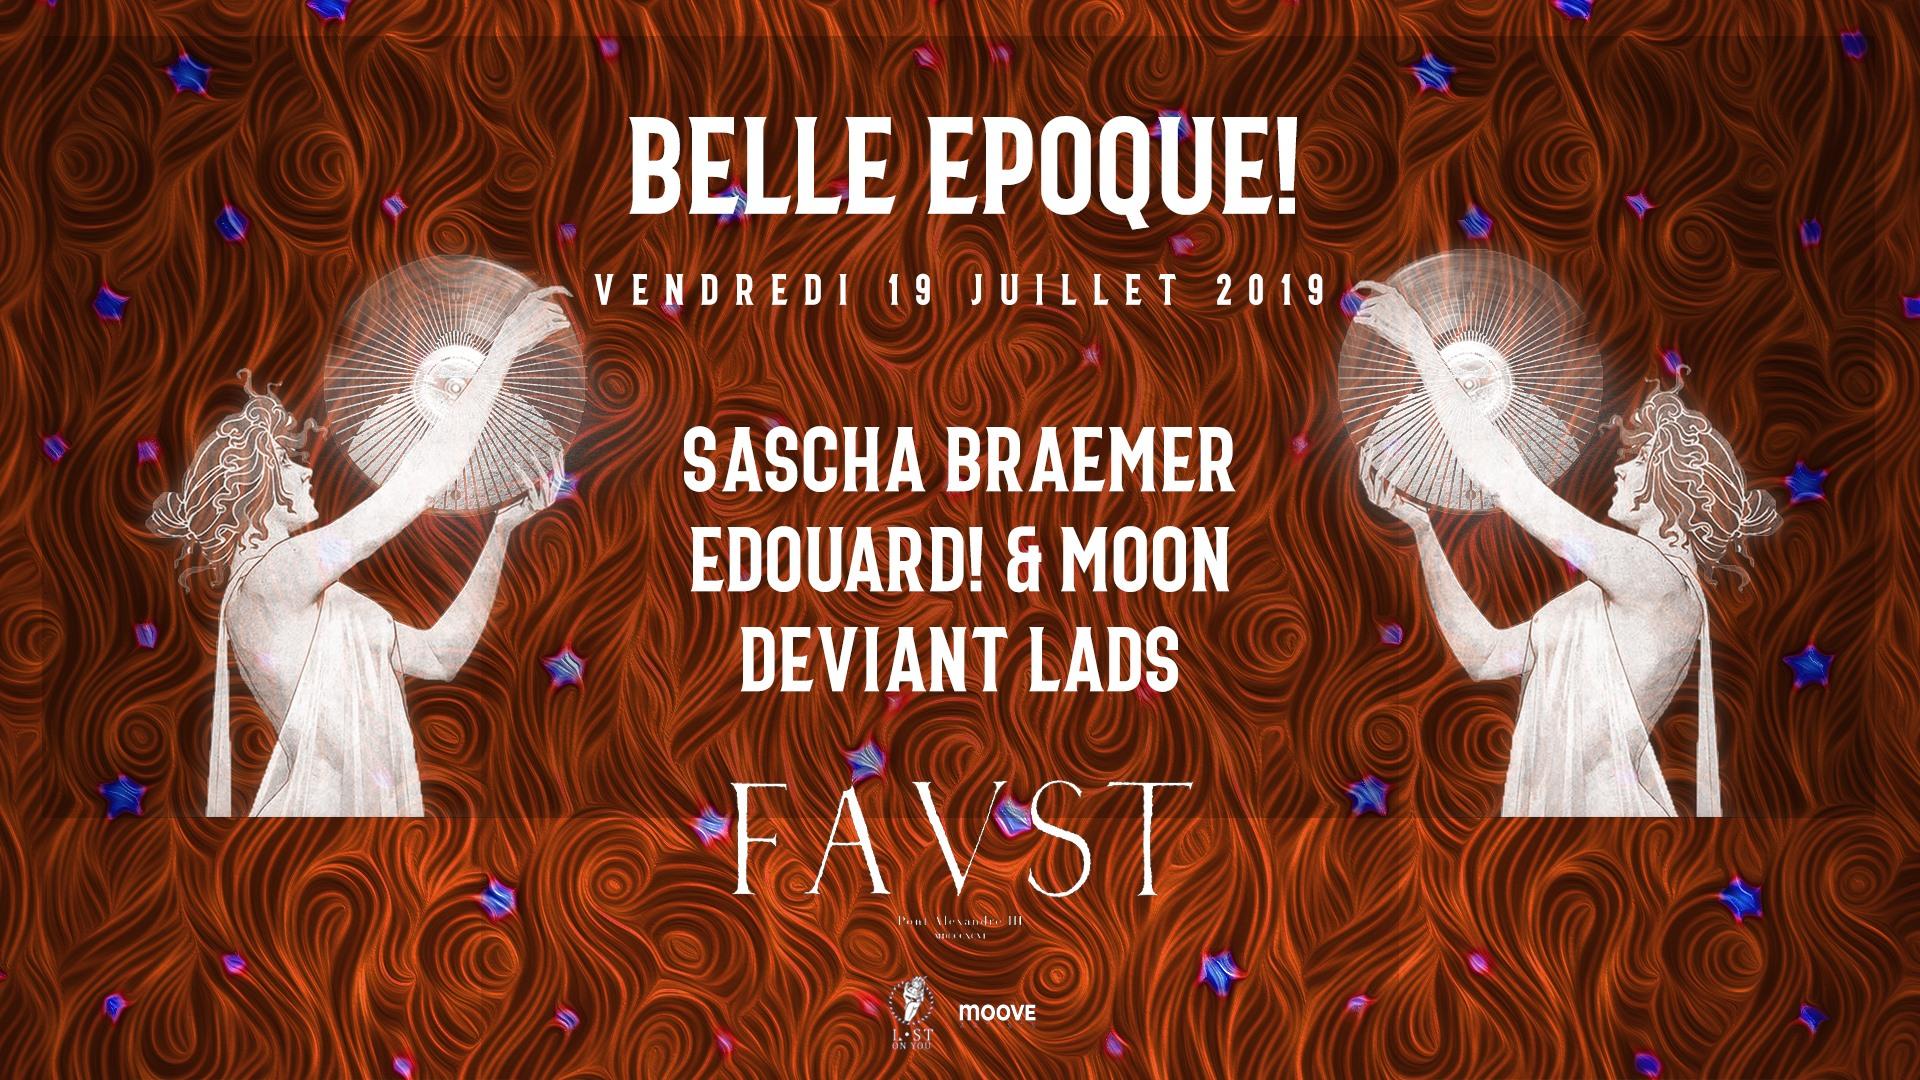 Faust — Belle Epoque! : Sascha Braemer, E! & Moon, Deviant Lads